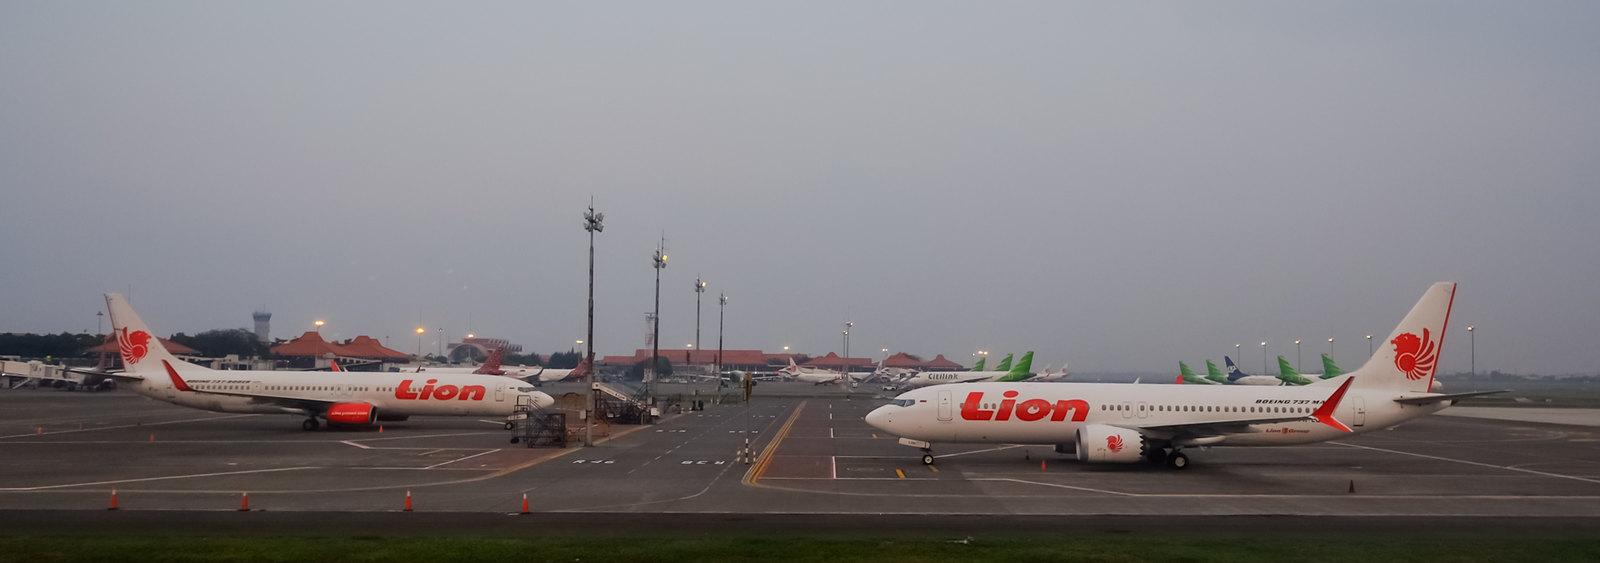 Lion Air jets